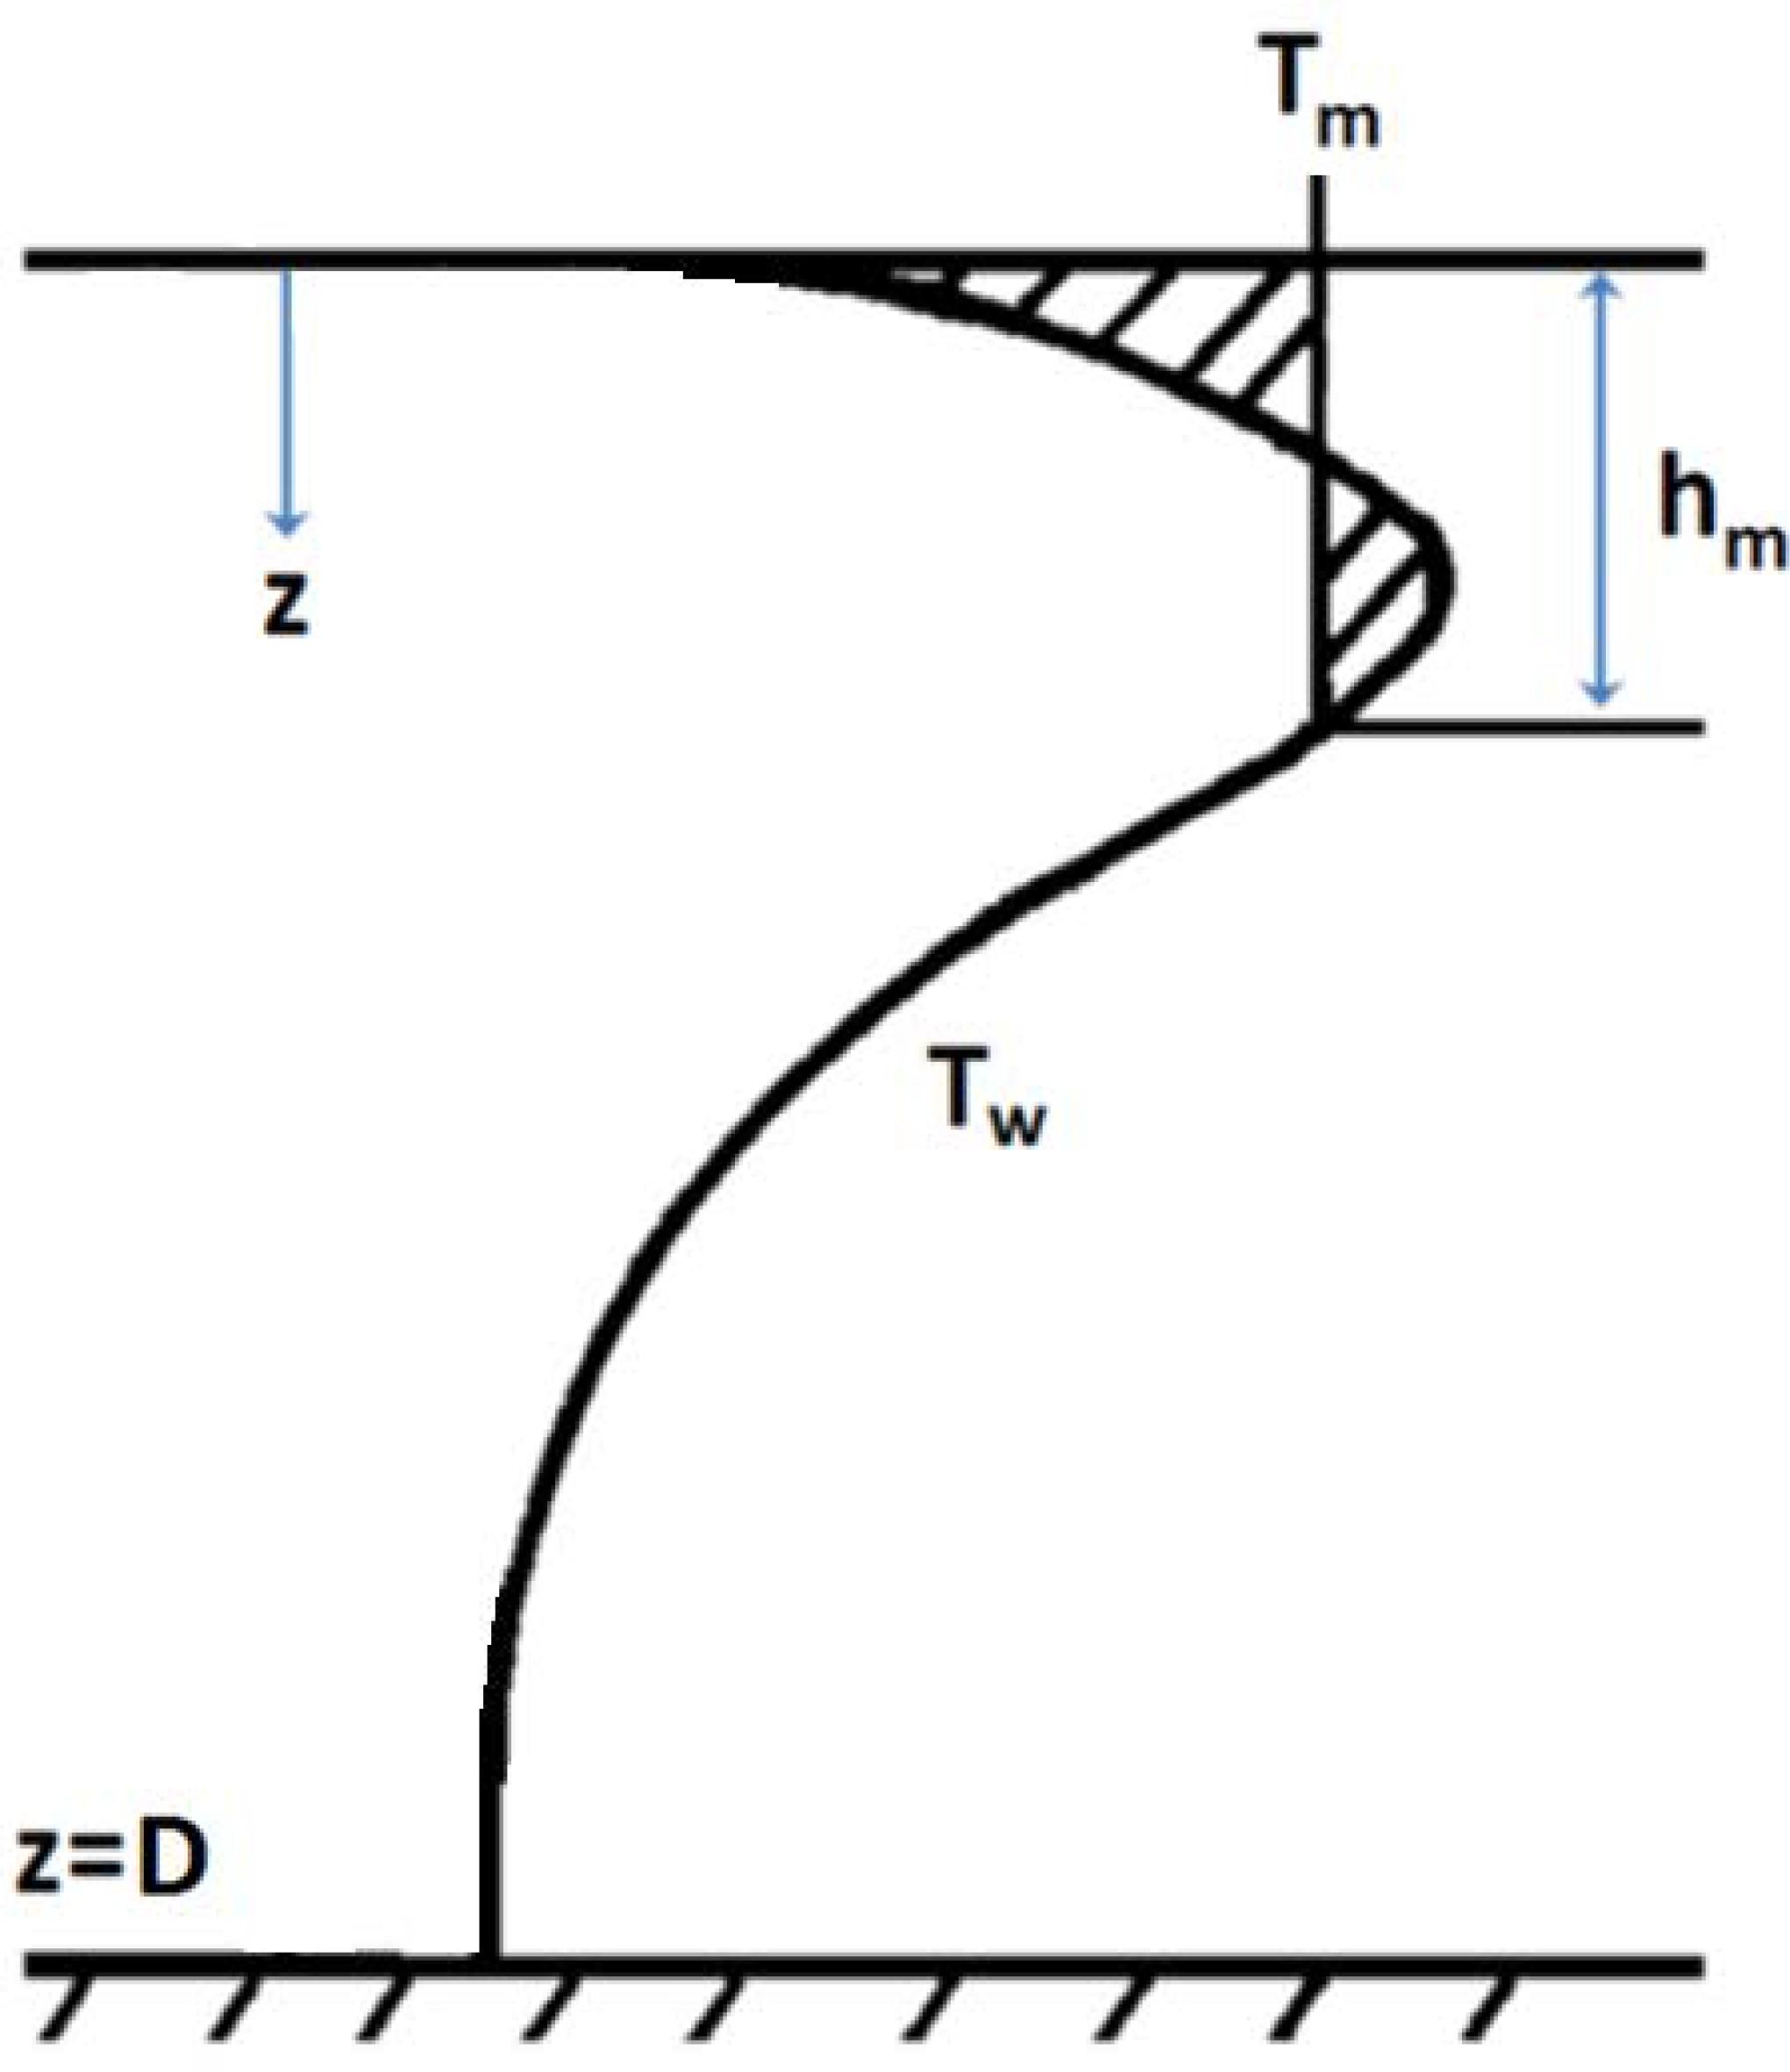 Aminzadeh Mf 1130 Wiring Diagram